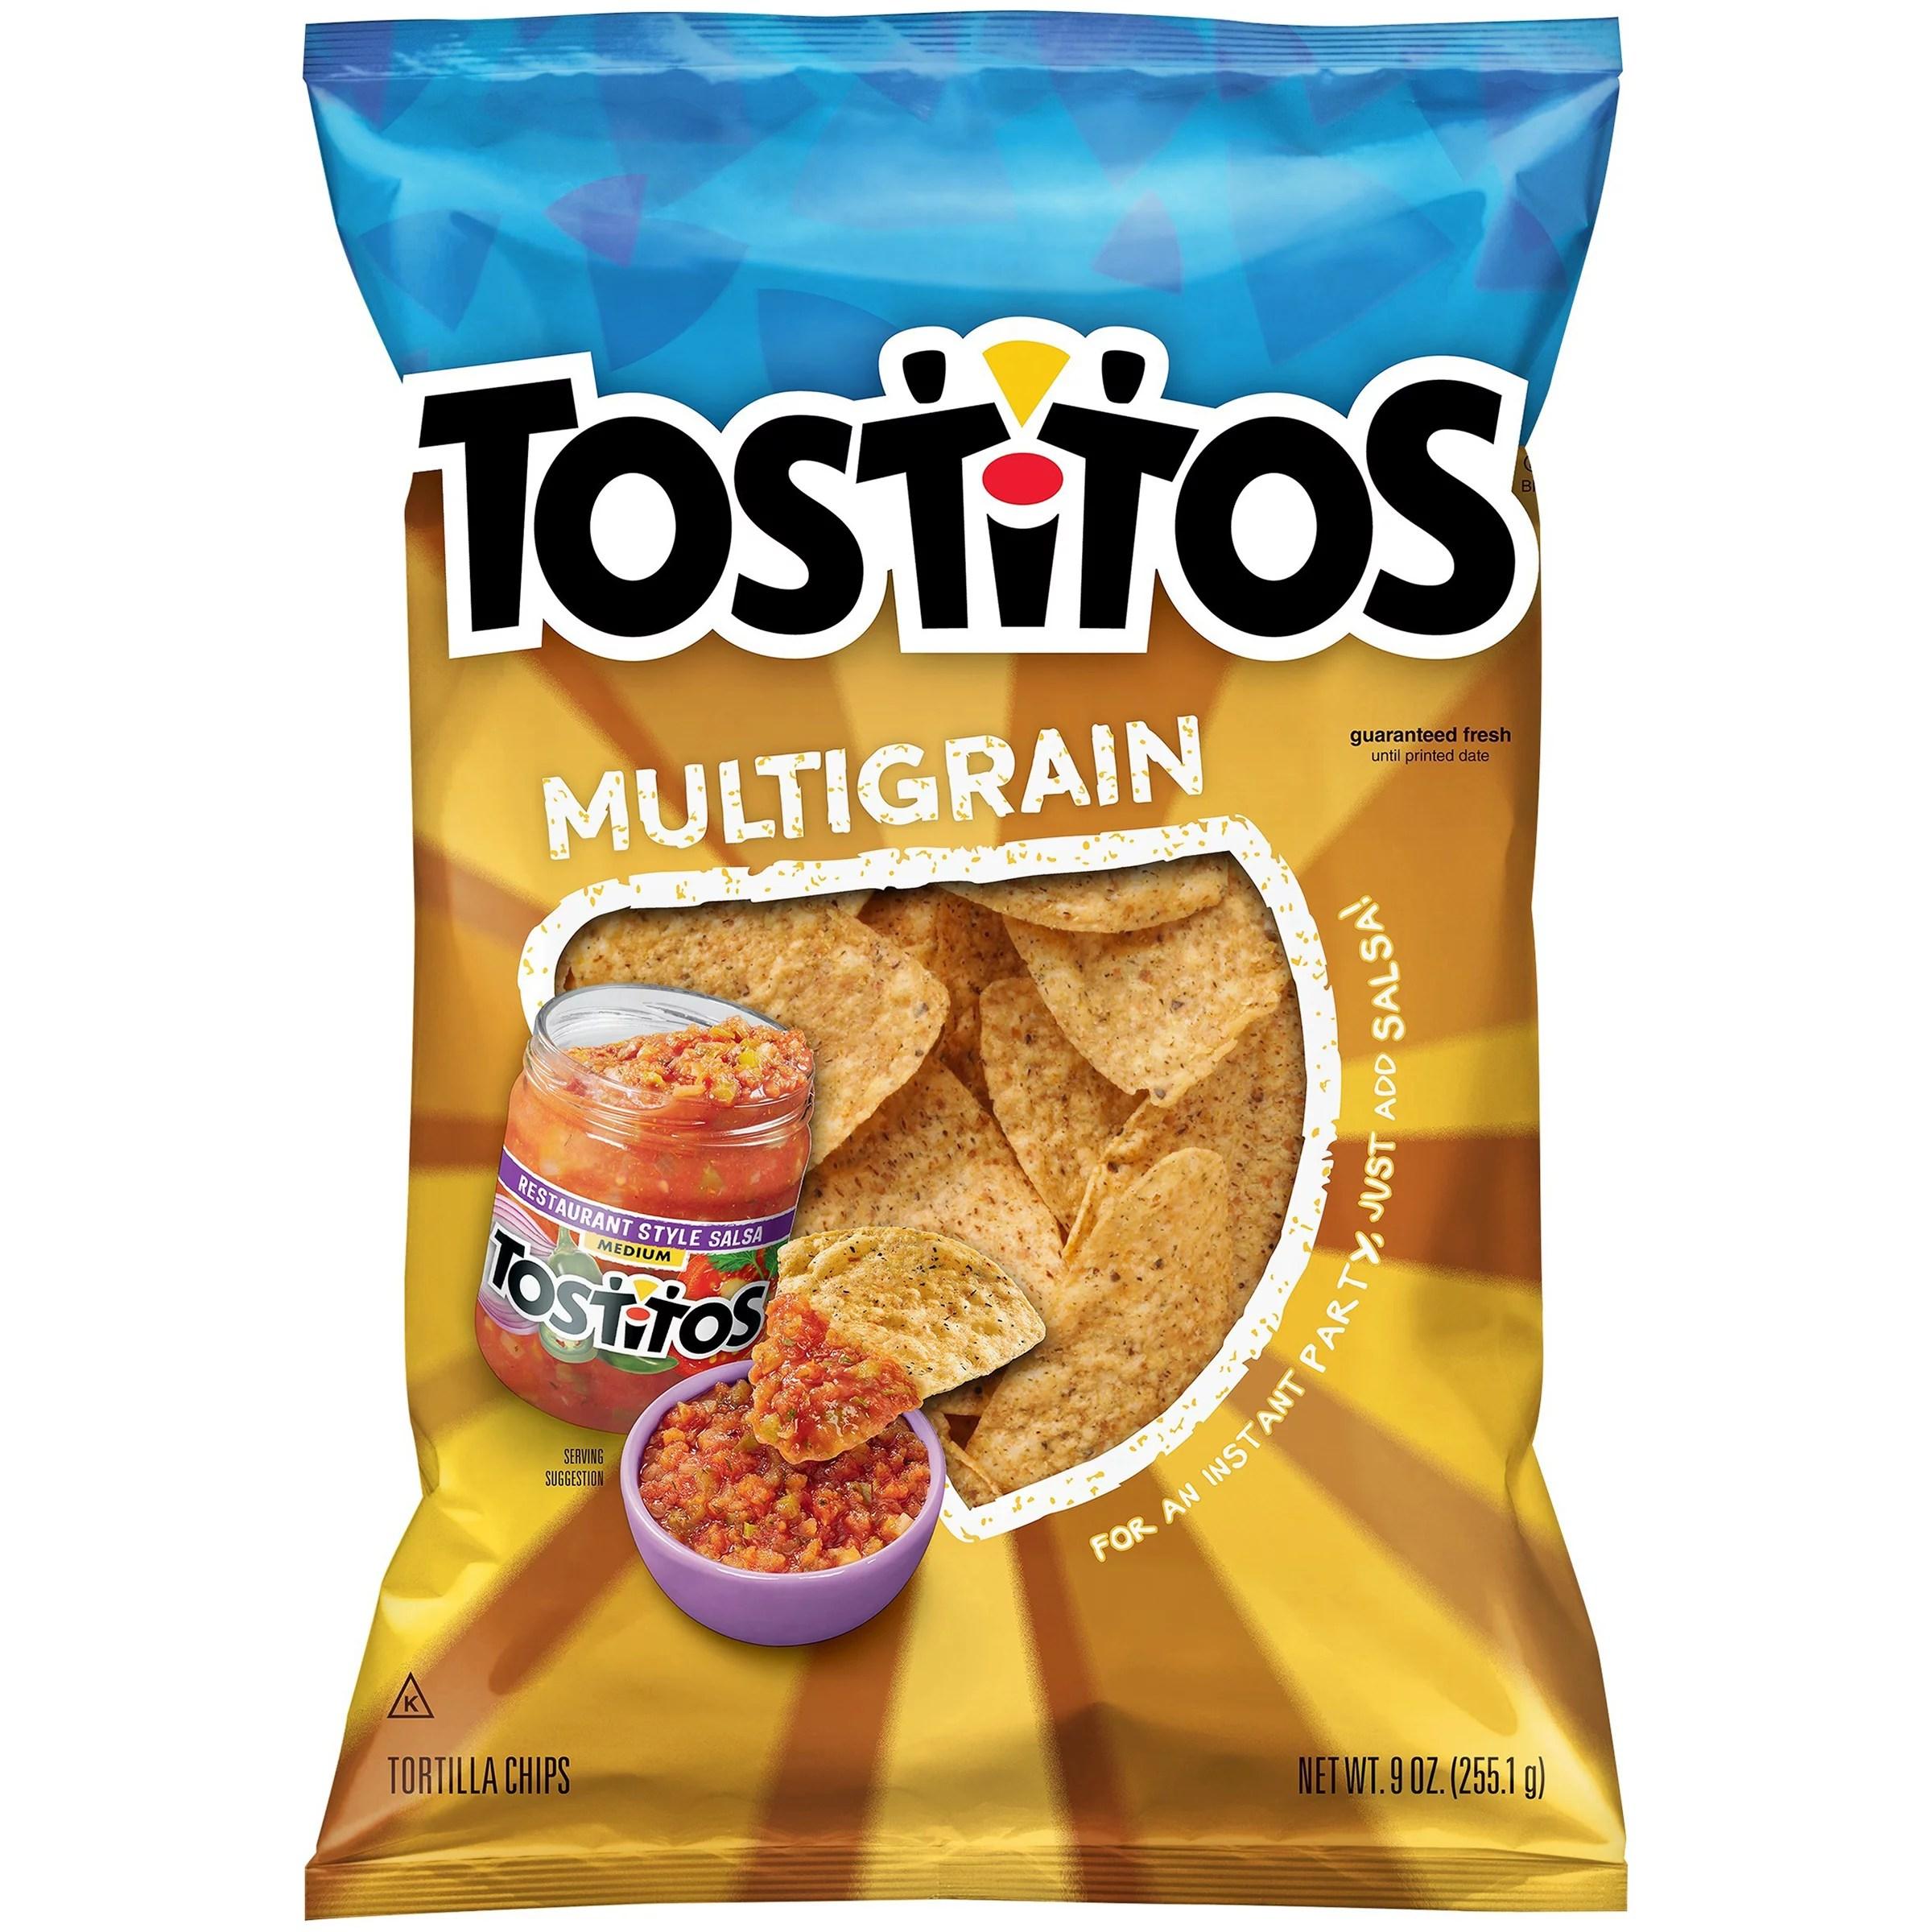 Tostitos Multigrain Tortilla Chips 9 Oz